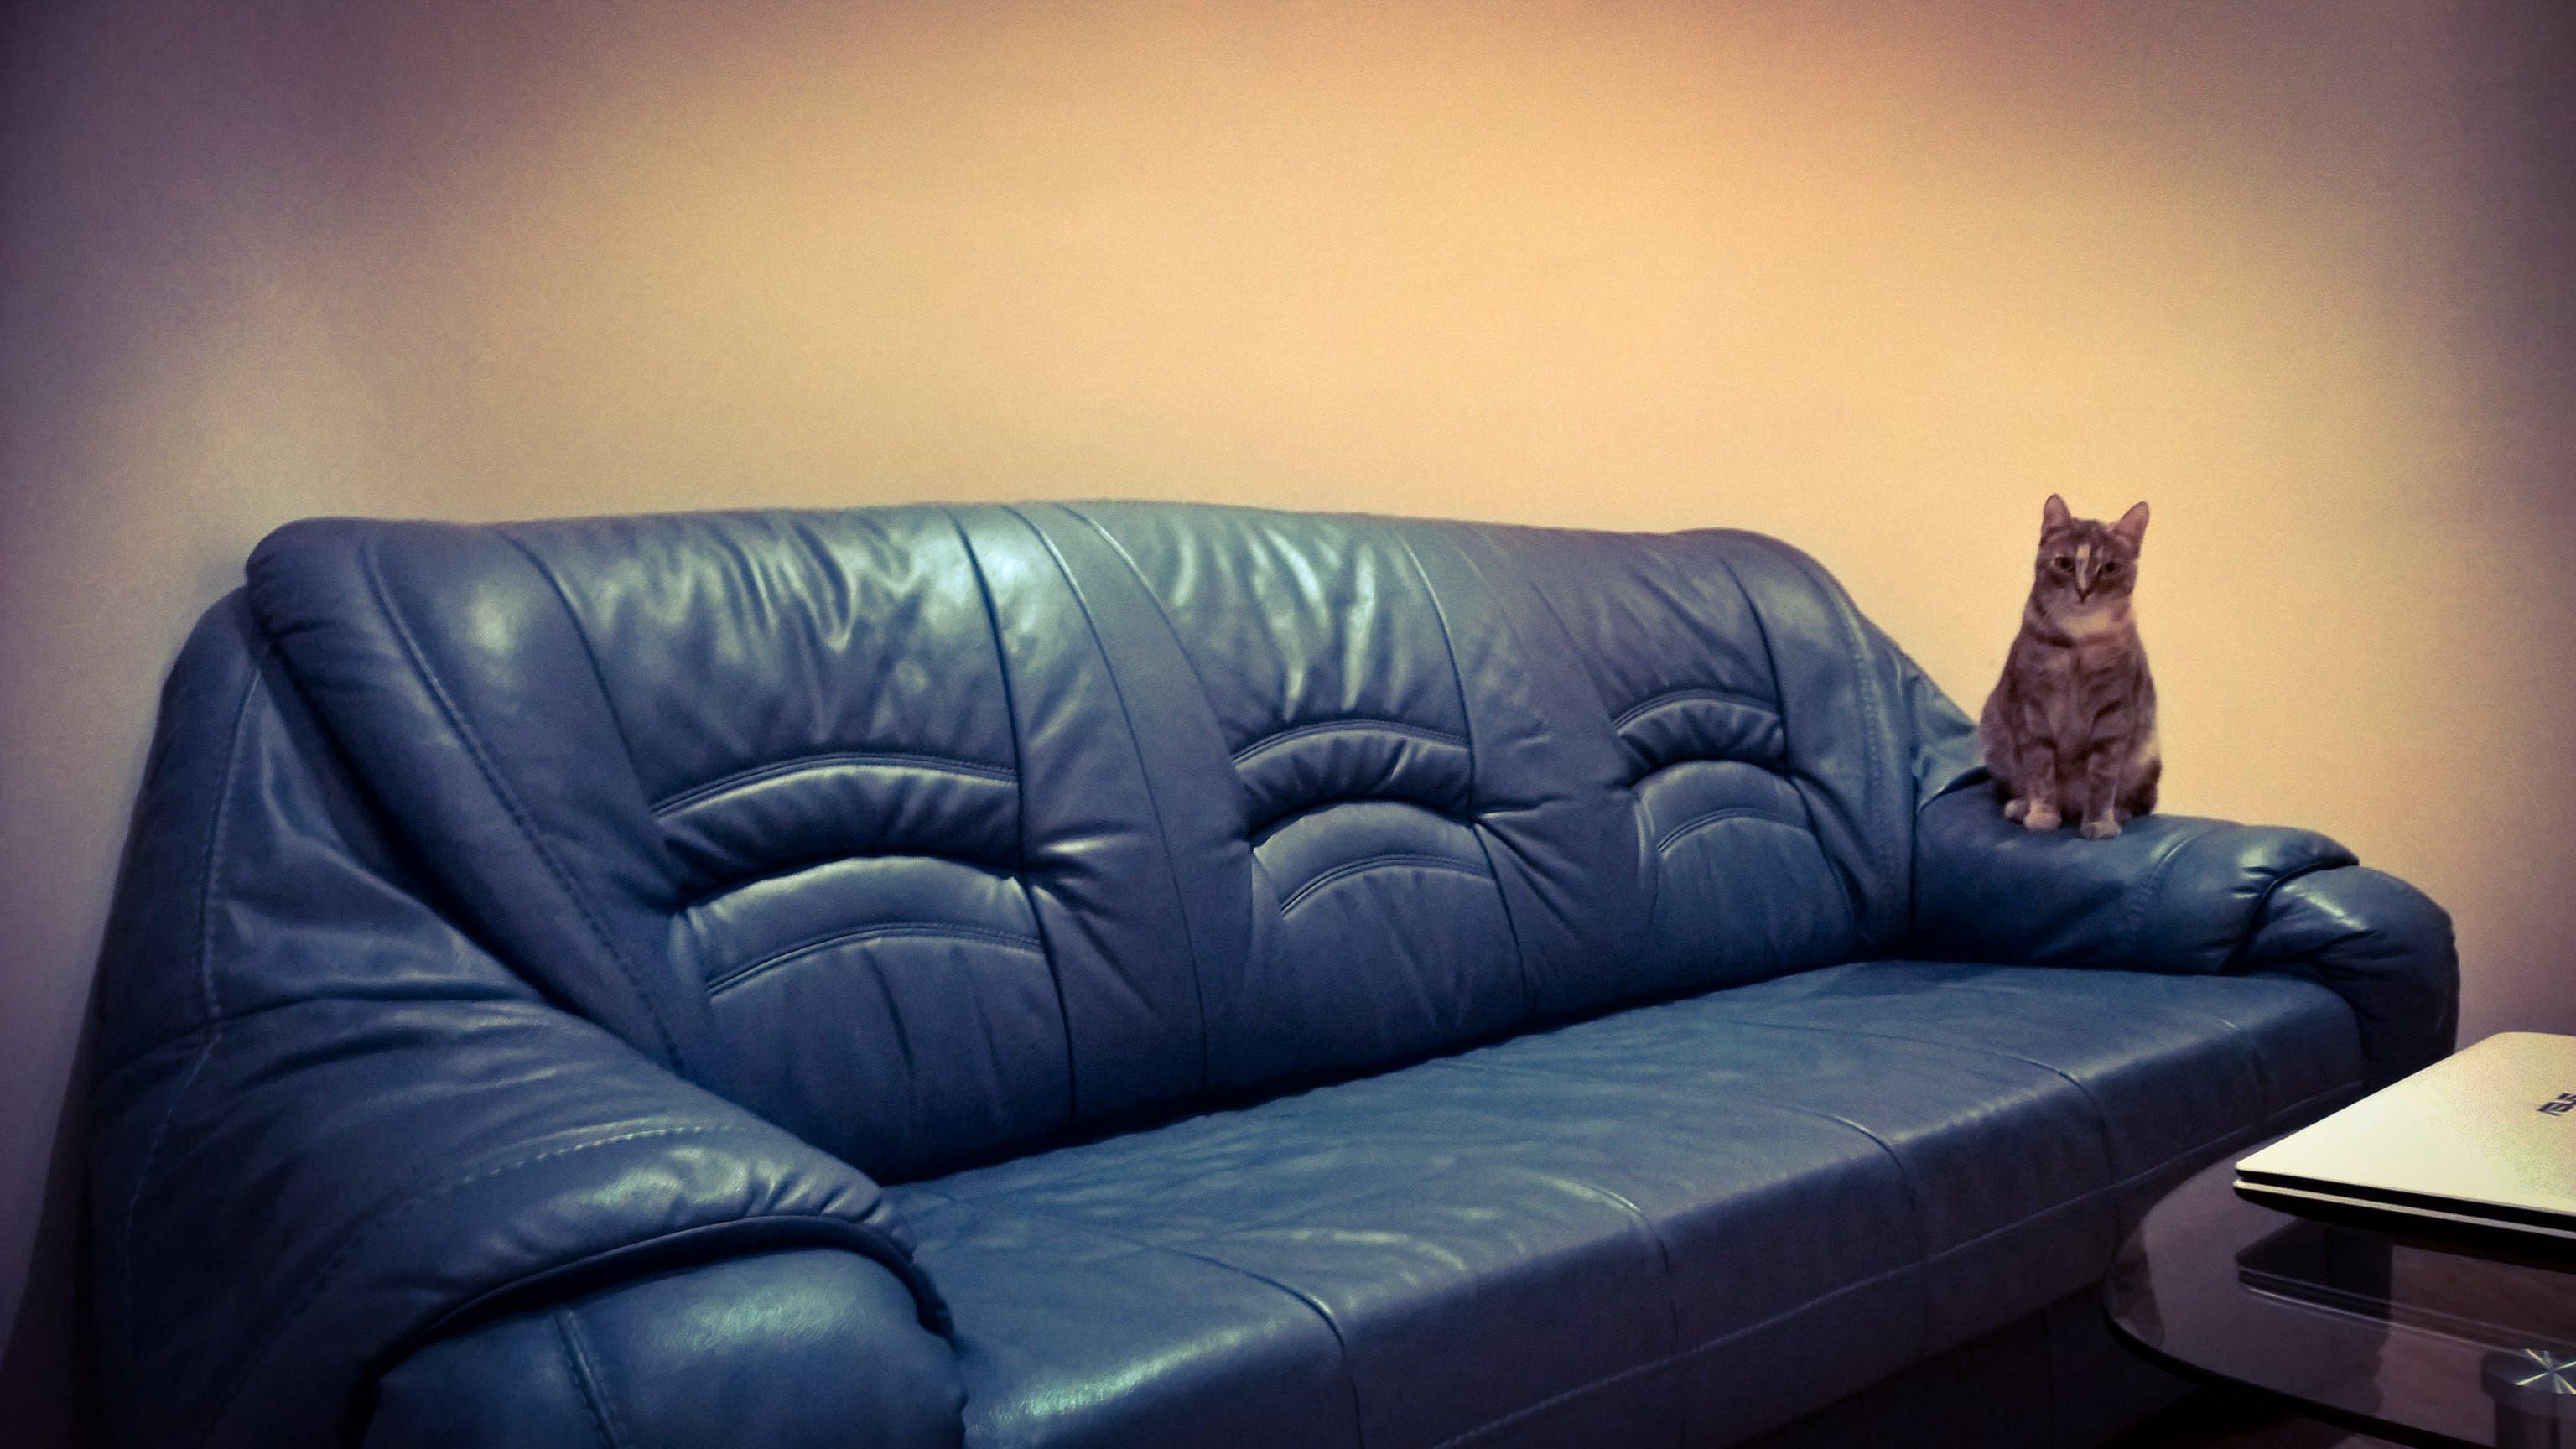 Free stock photo of cat, sofa, hungary, Budapest